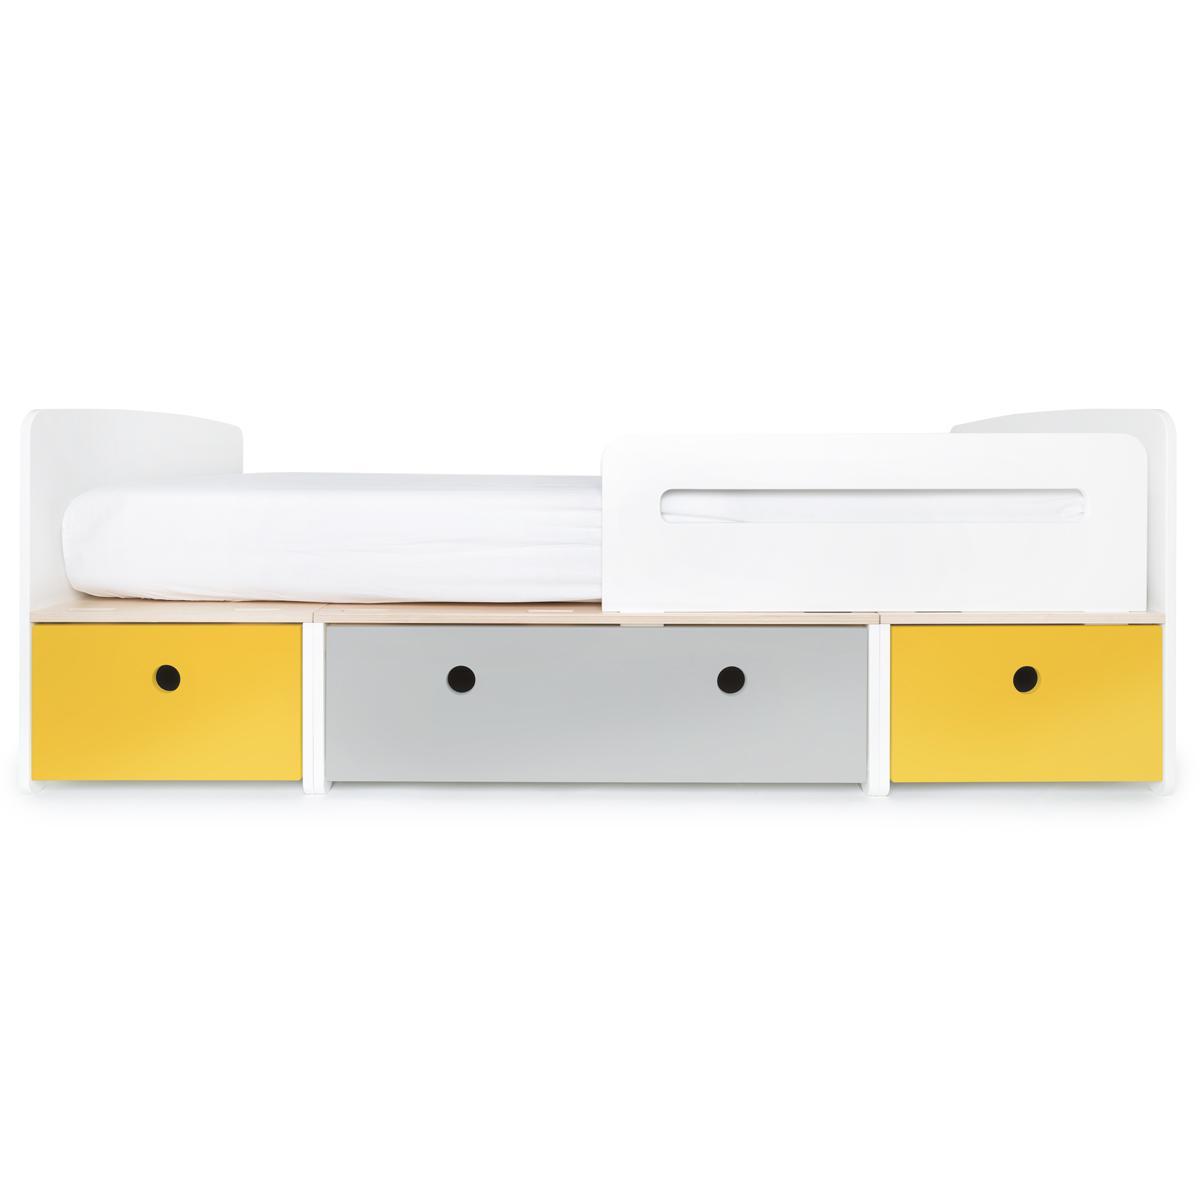 Cama evolutiva 90x200cm COLORFLEX nectar yellow-pearl grey-nectar yellow